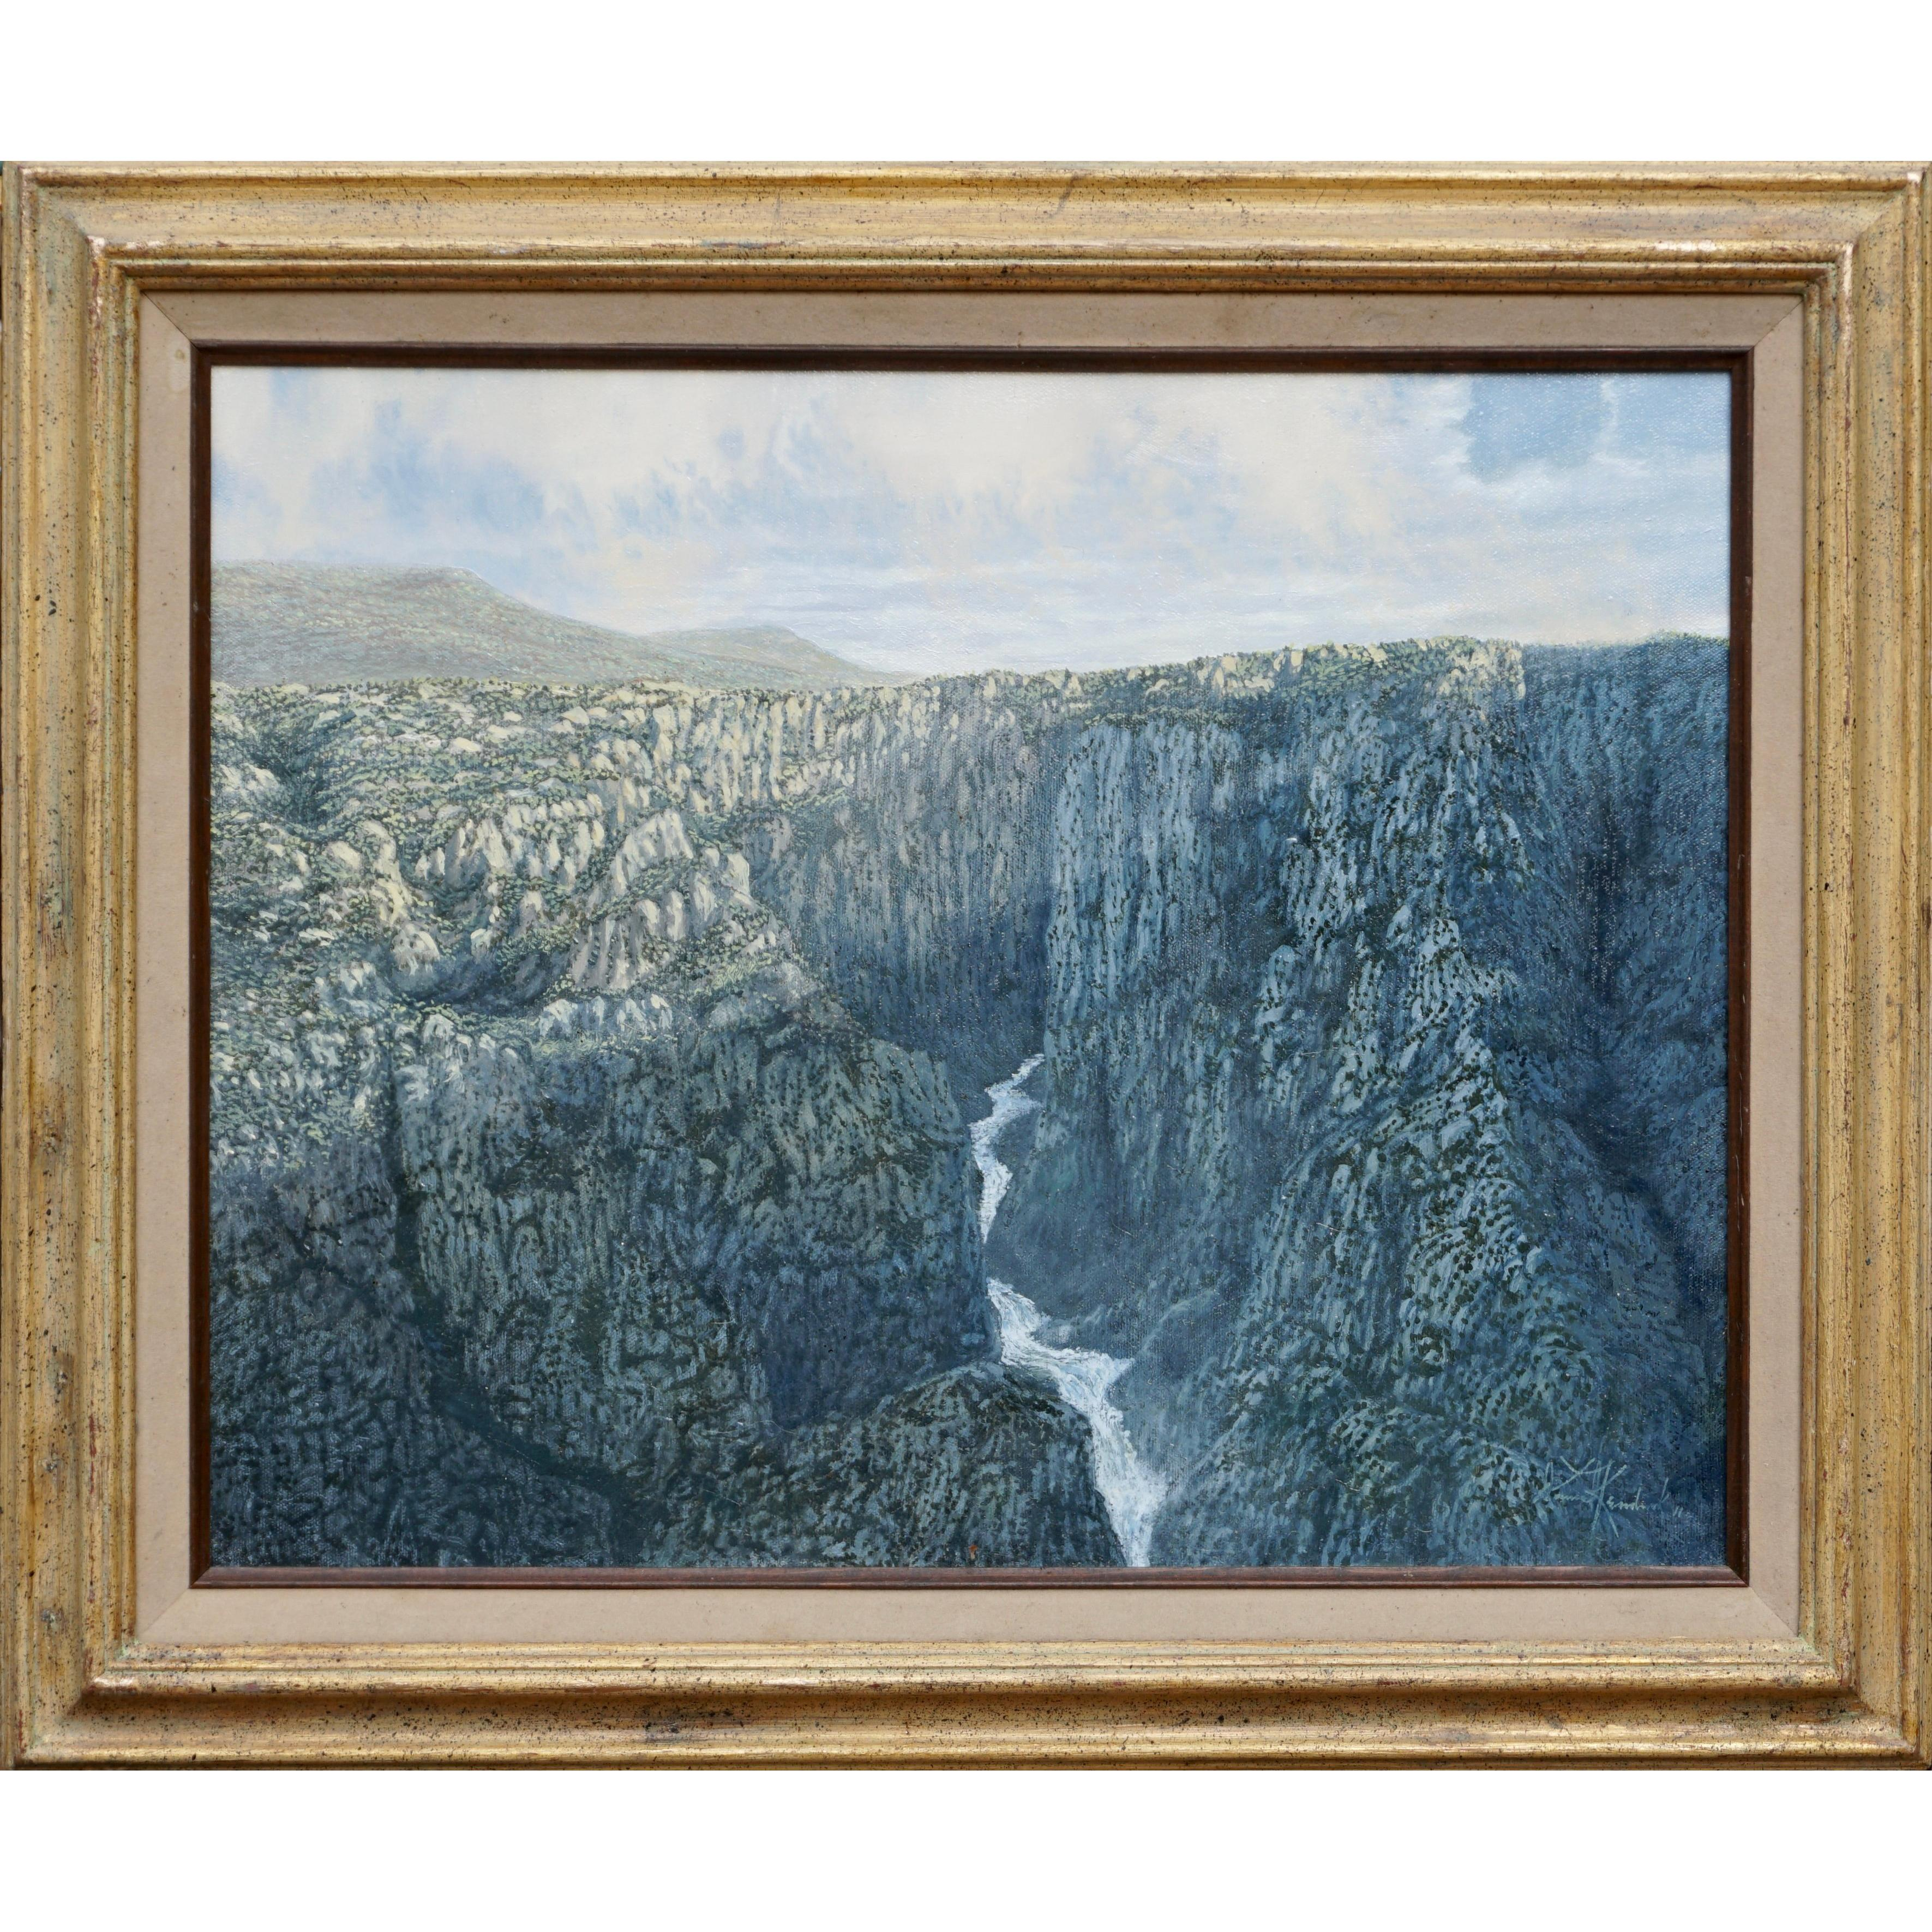 "Daniel Kendrick Oil Painting ""The Great Divide"""